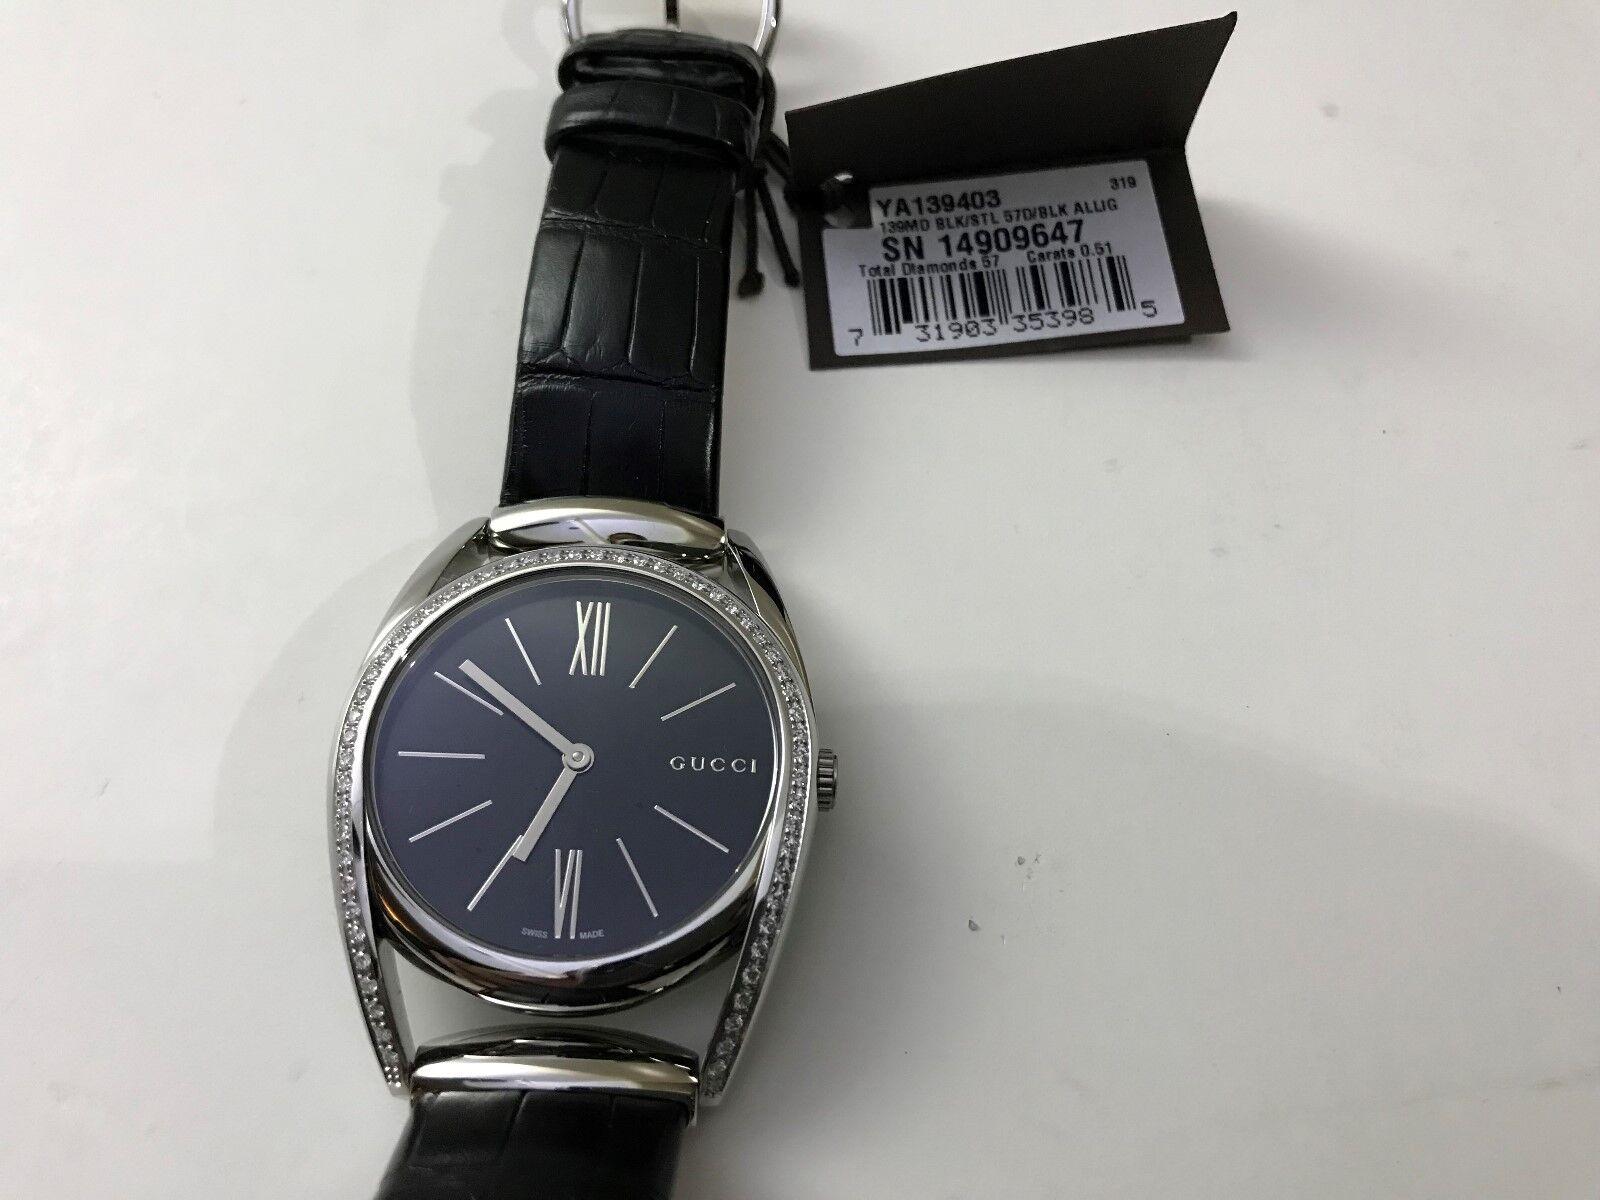 698916c72d8 Gucci YA140506 Horsebit Quartz Stainless Steel and Leather Black ...